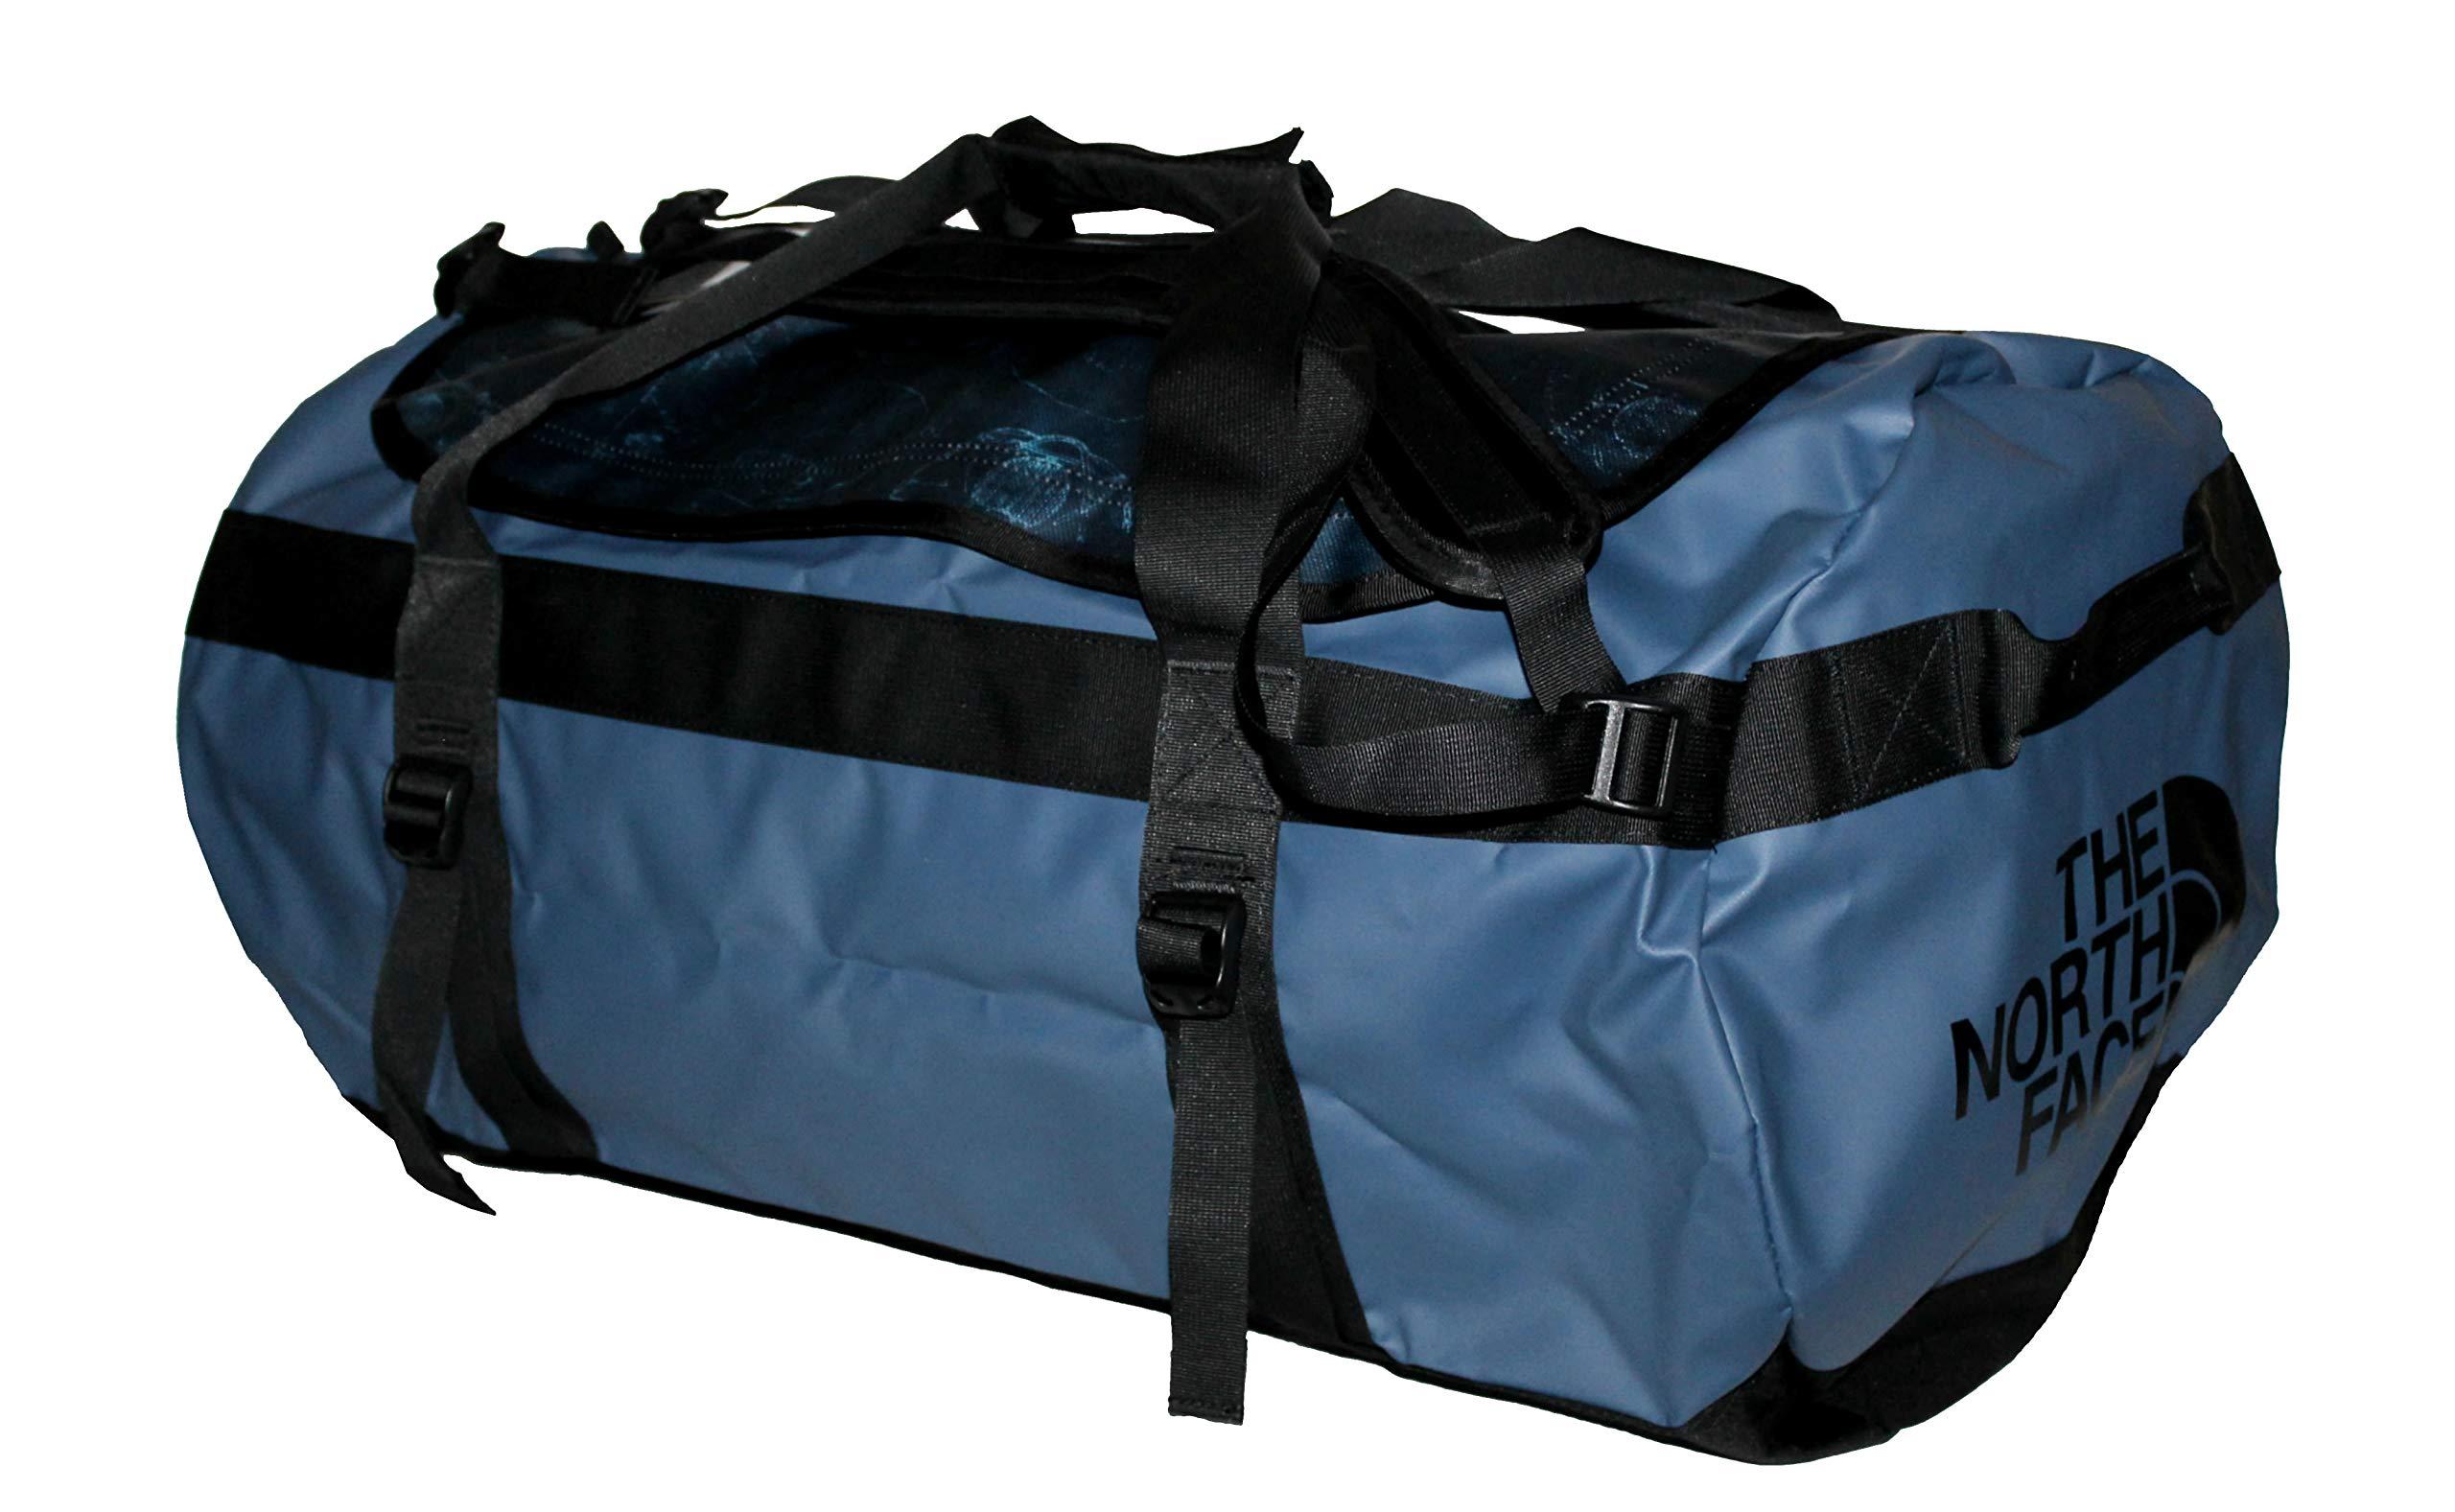 THE NORTH FACE GOLDEN STATE 90 L DUFFEL BAG - L (COSMIC BLUE PRINT)